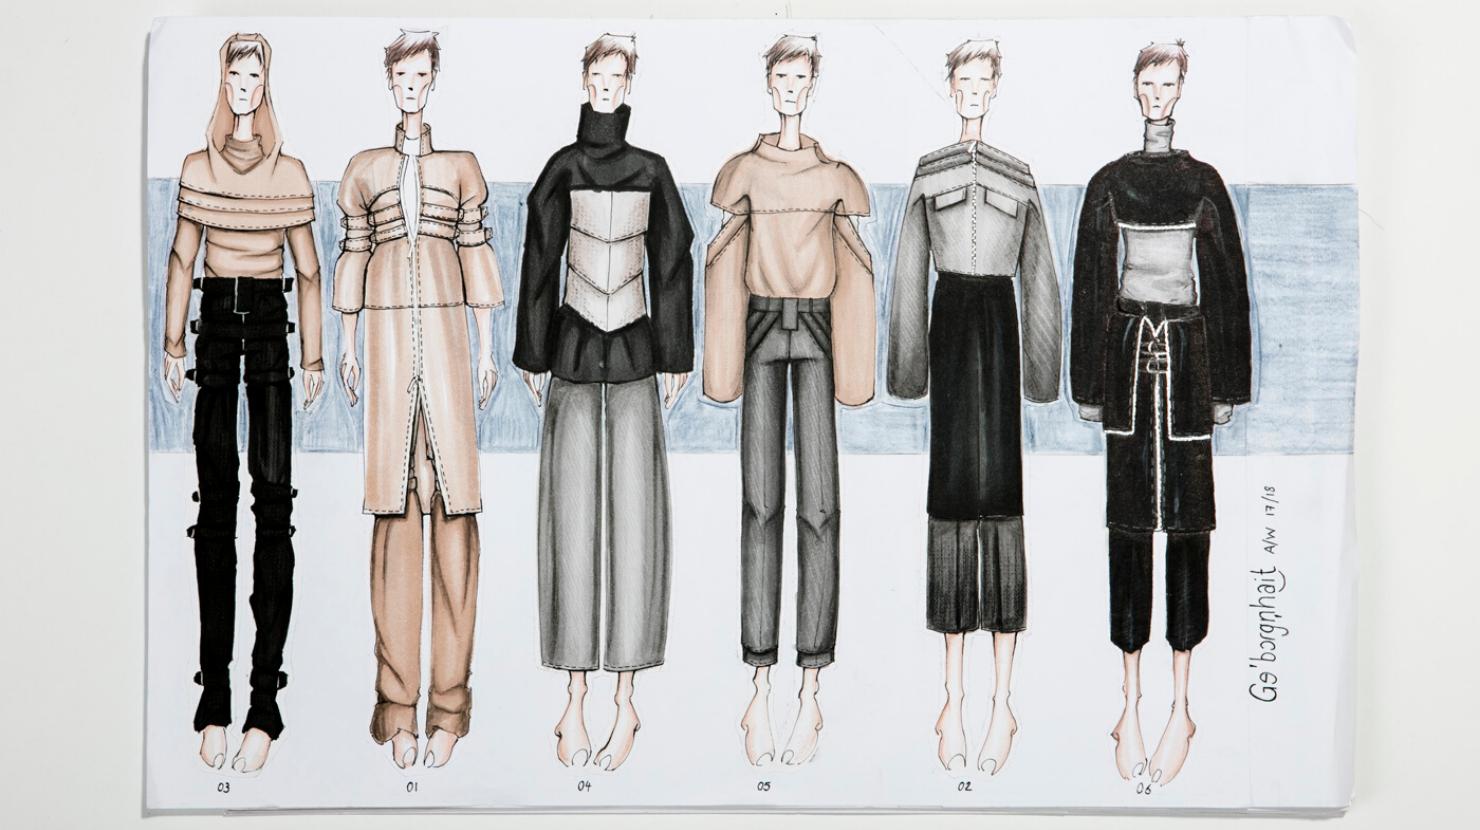 Ba Fashion Design Full Part Time Course Ireland